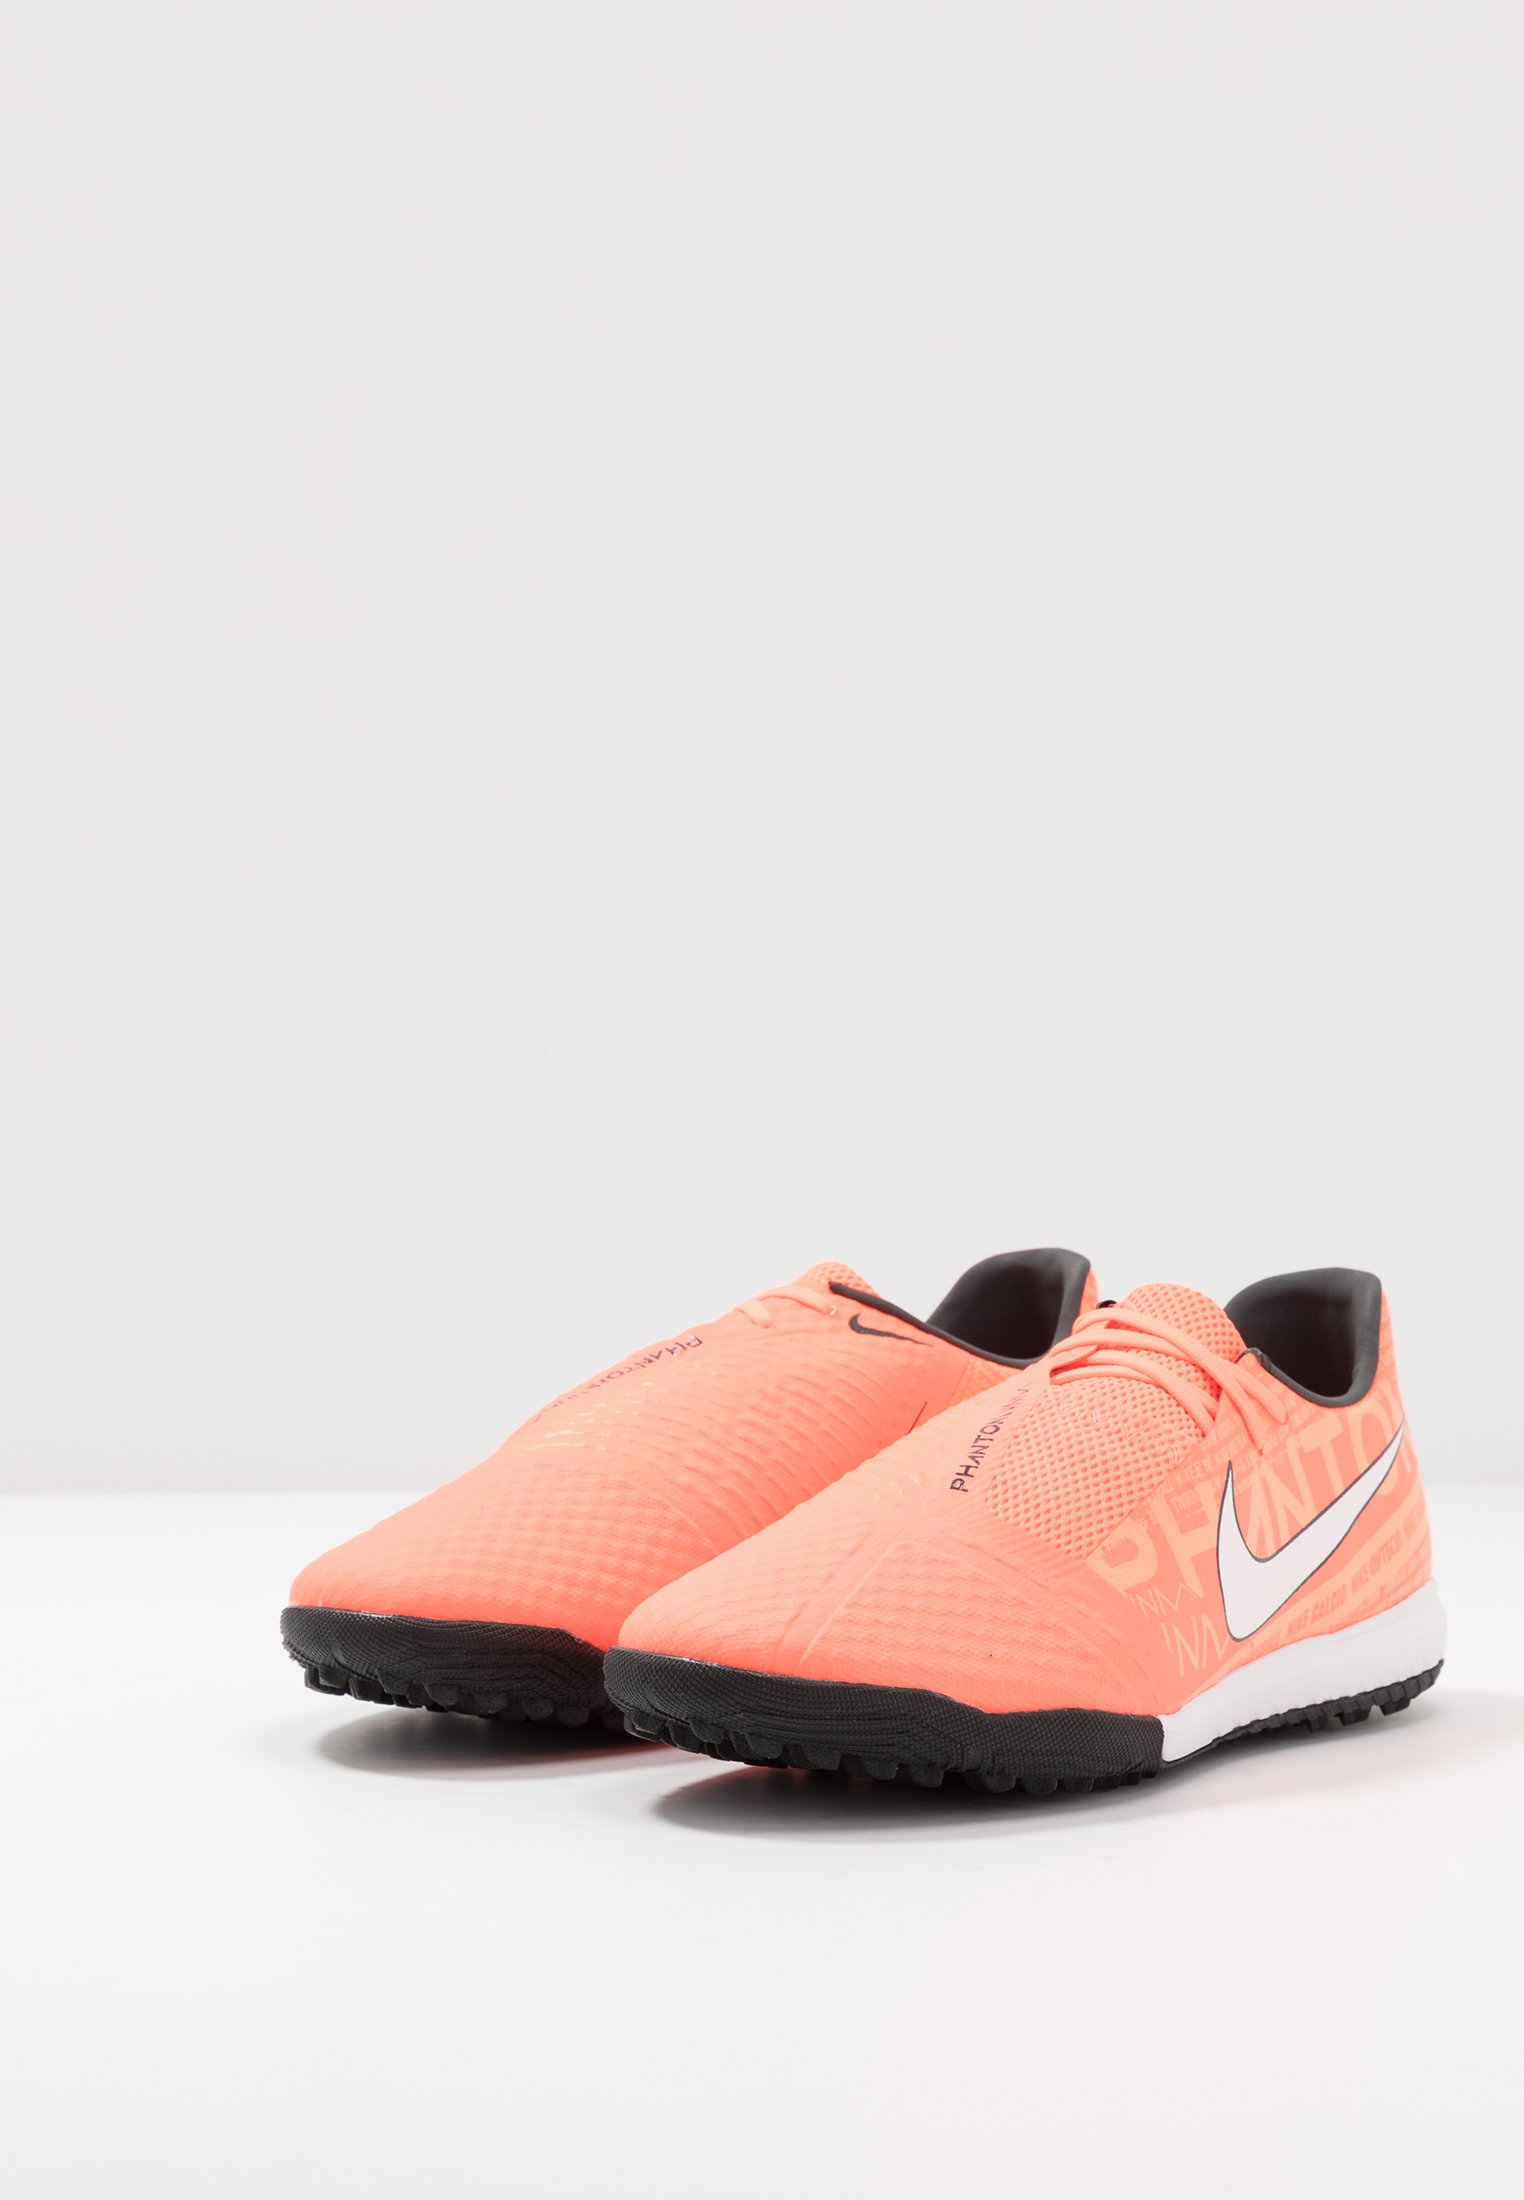 Nike Performance PHANTOM ACADEMY TF - Fußballschuh Multinocken - bright mango/white/orange/anthracite/orange - Herrenschuhe E66dL